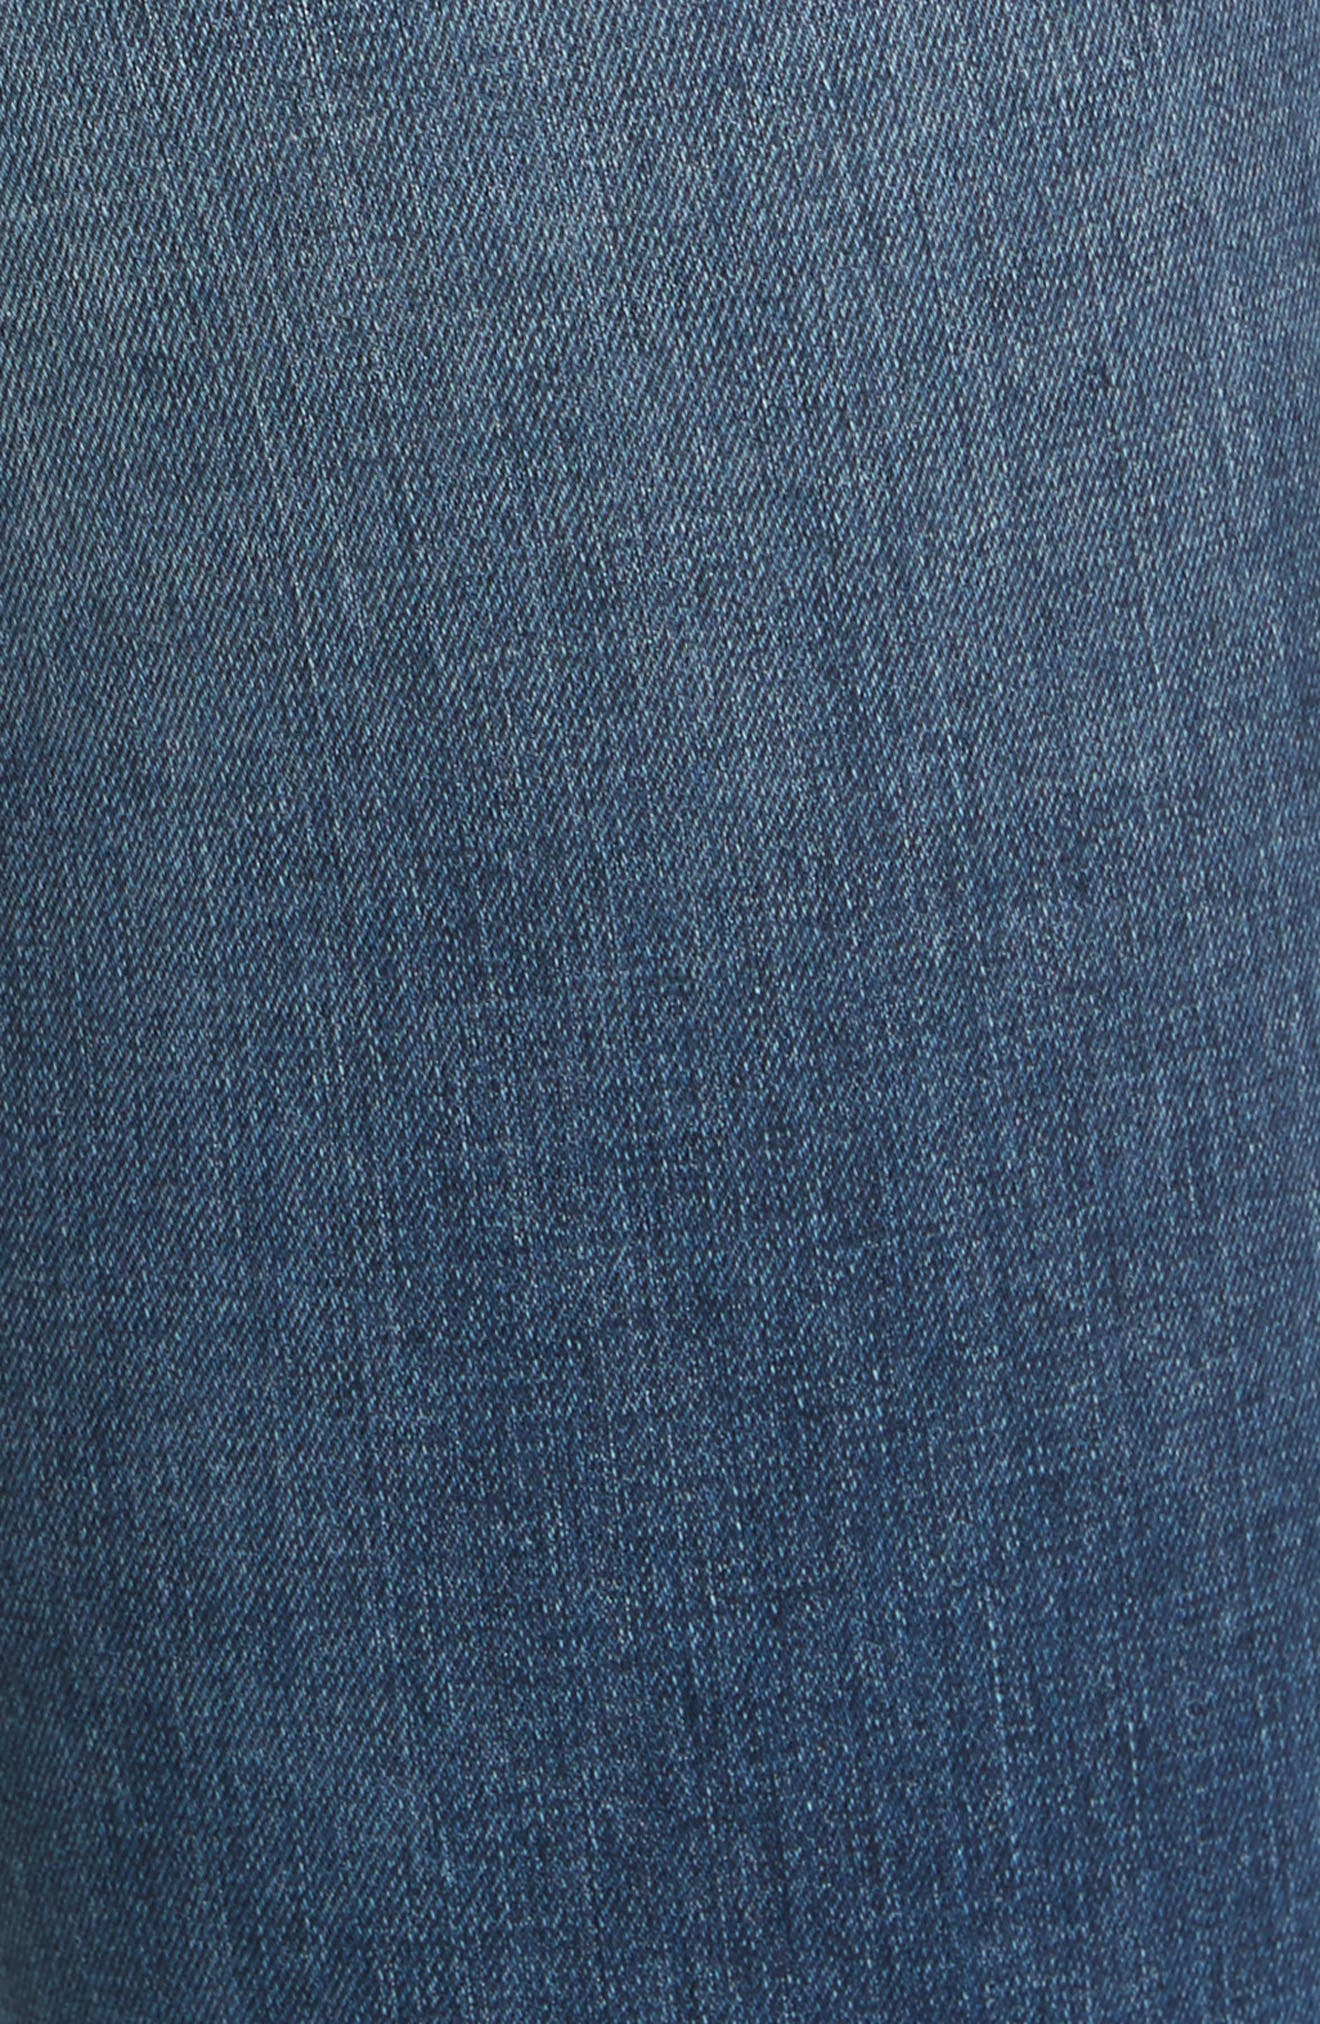 Clemence Skinny Jeans,                             Alternate thumbnail 5, color,                             401